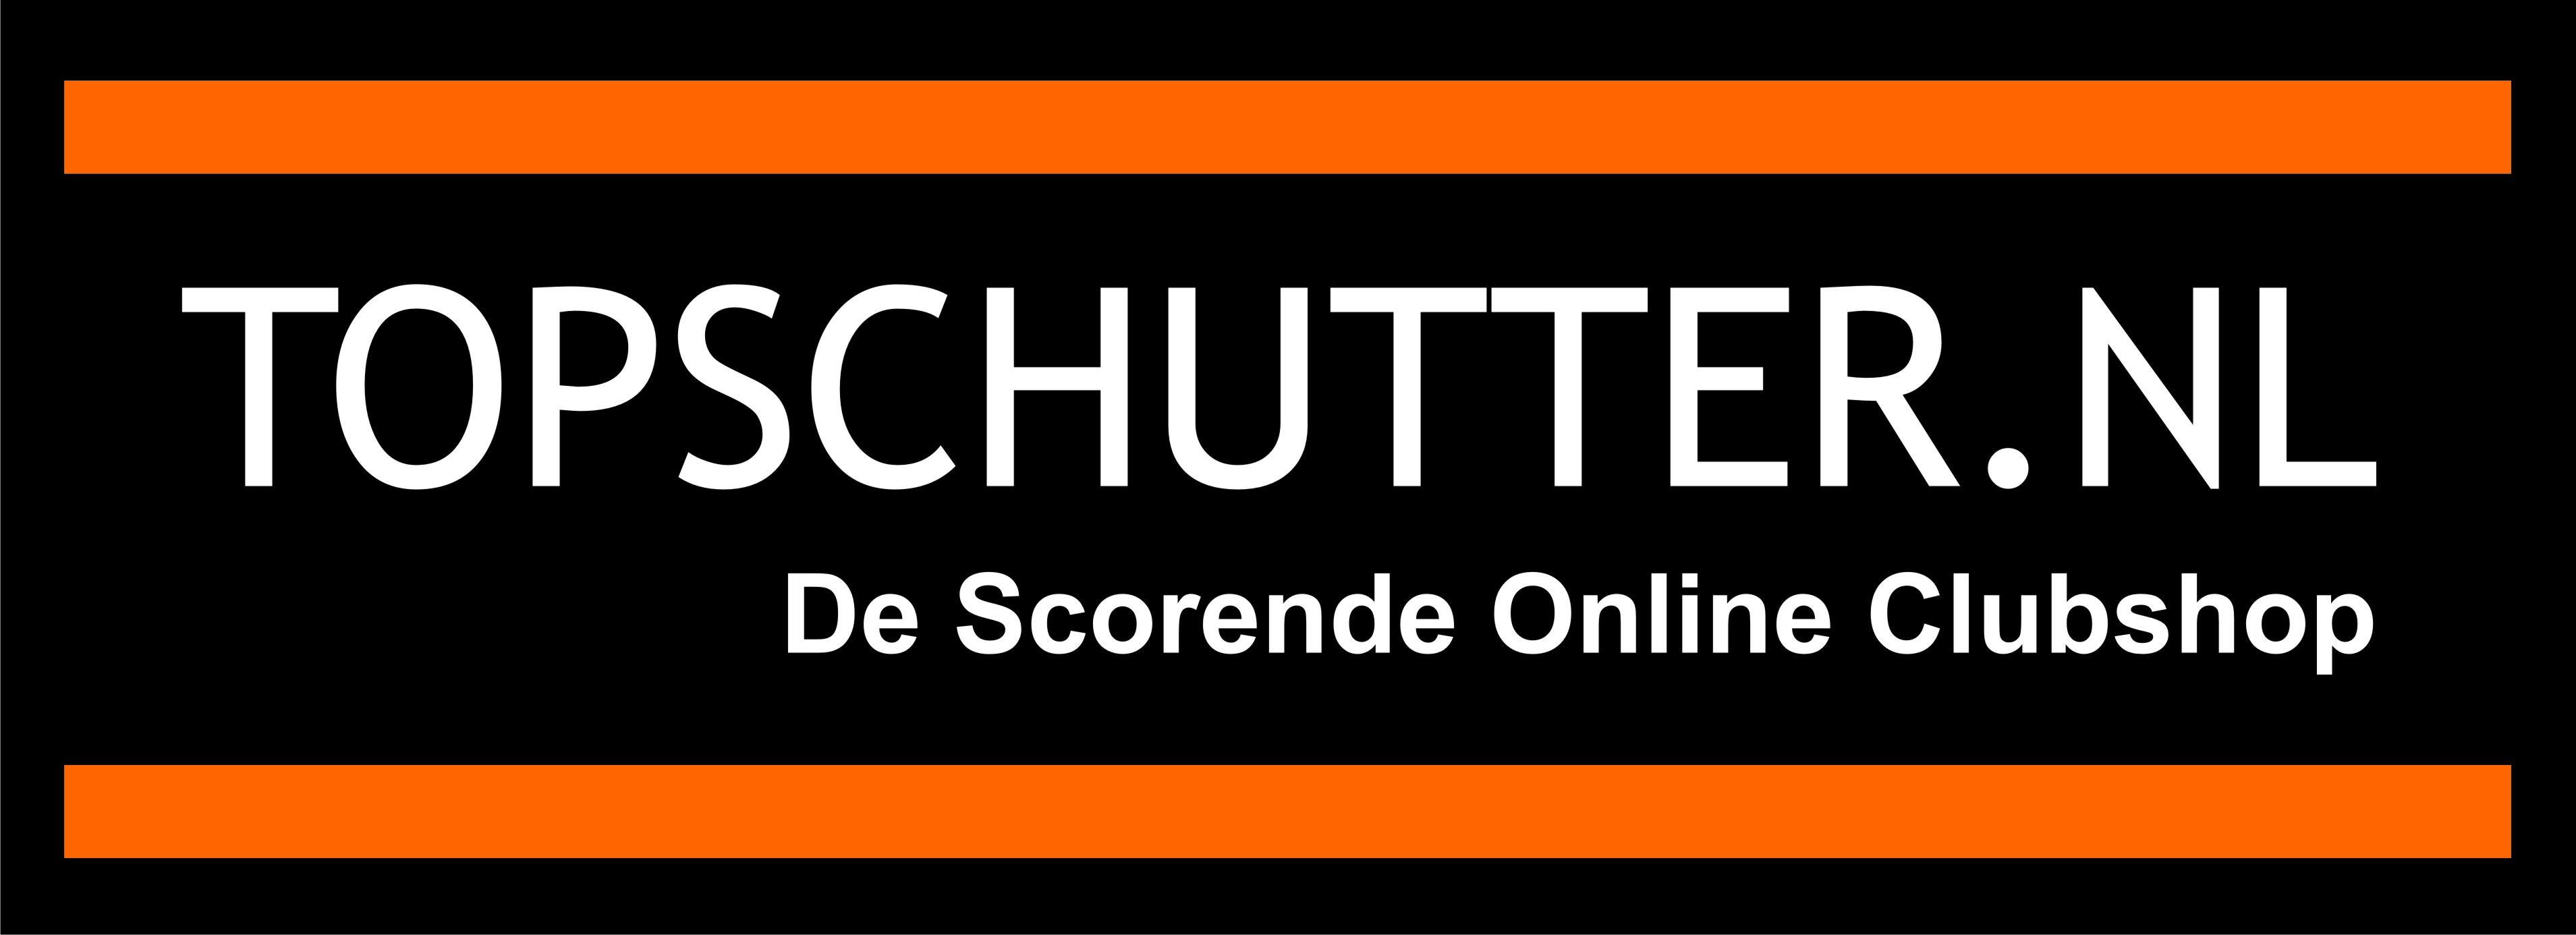 Teamkleding bij Topschutter.nl De Scorende Online Clubshop ...